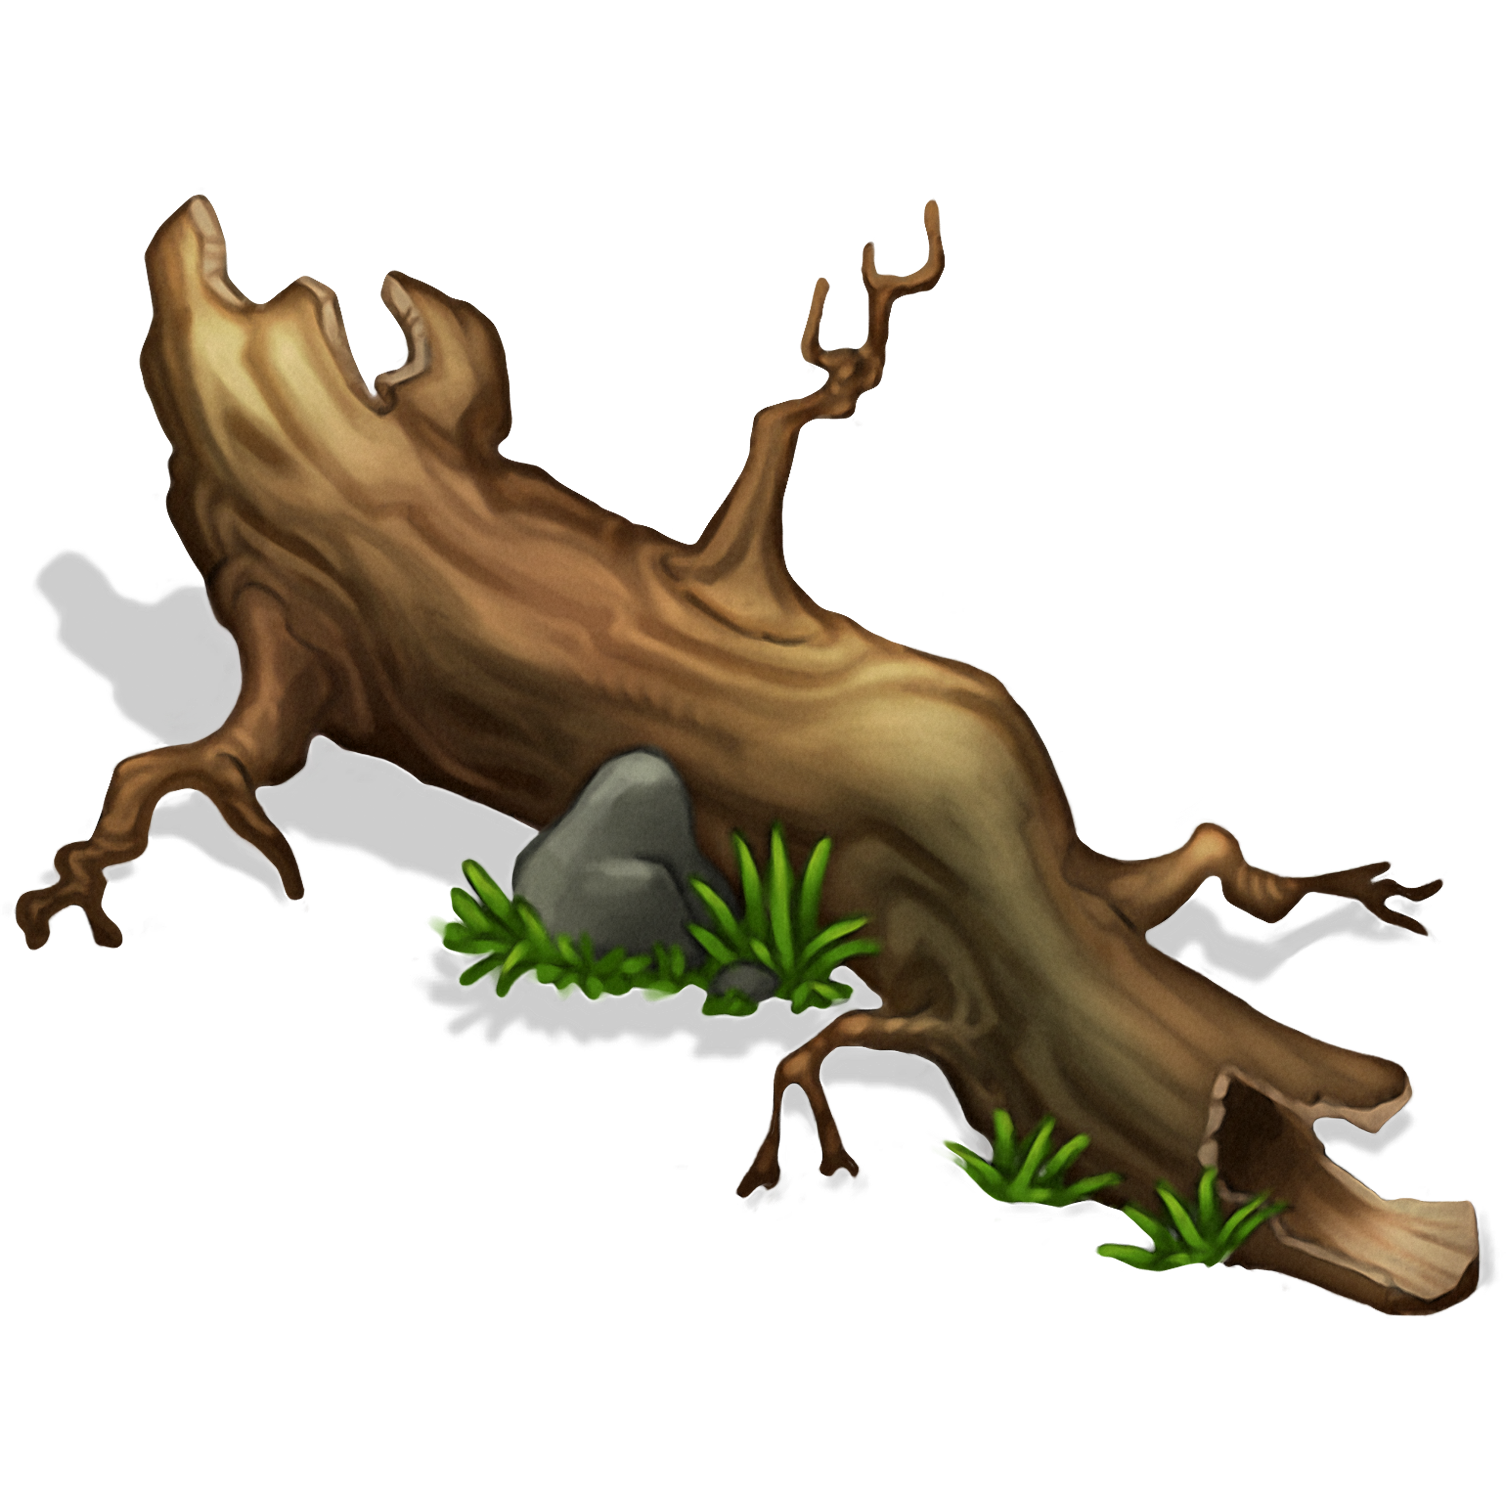 File:Hollow Log.png